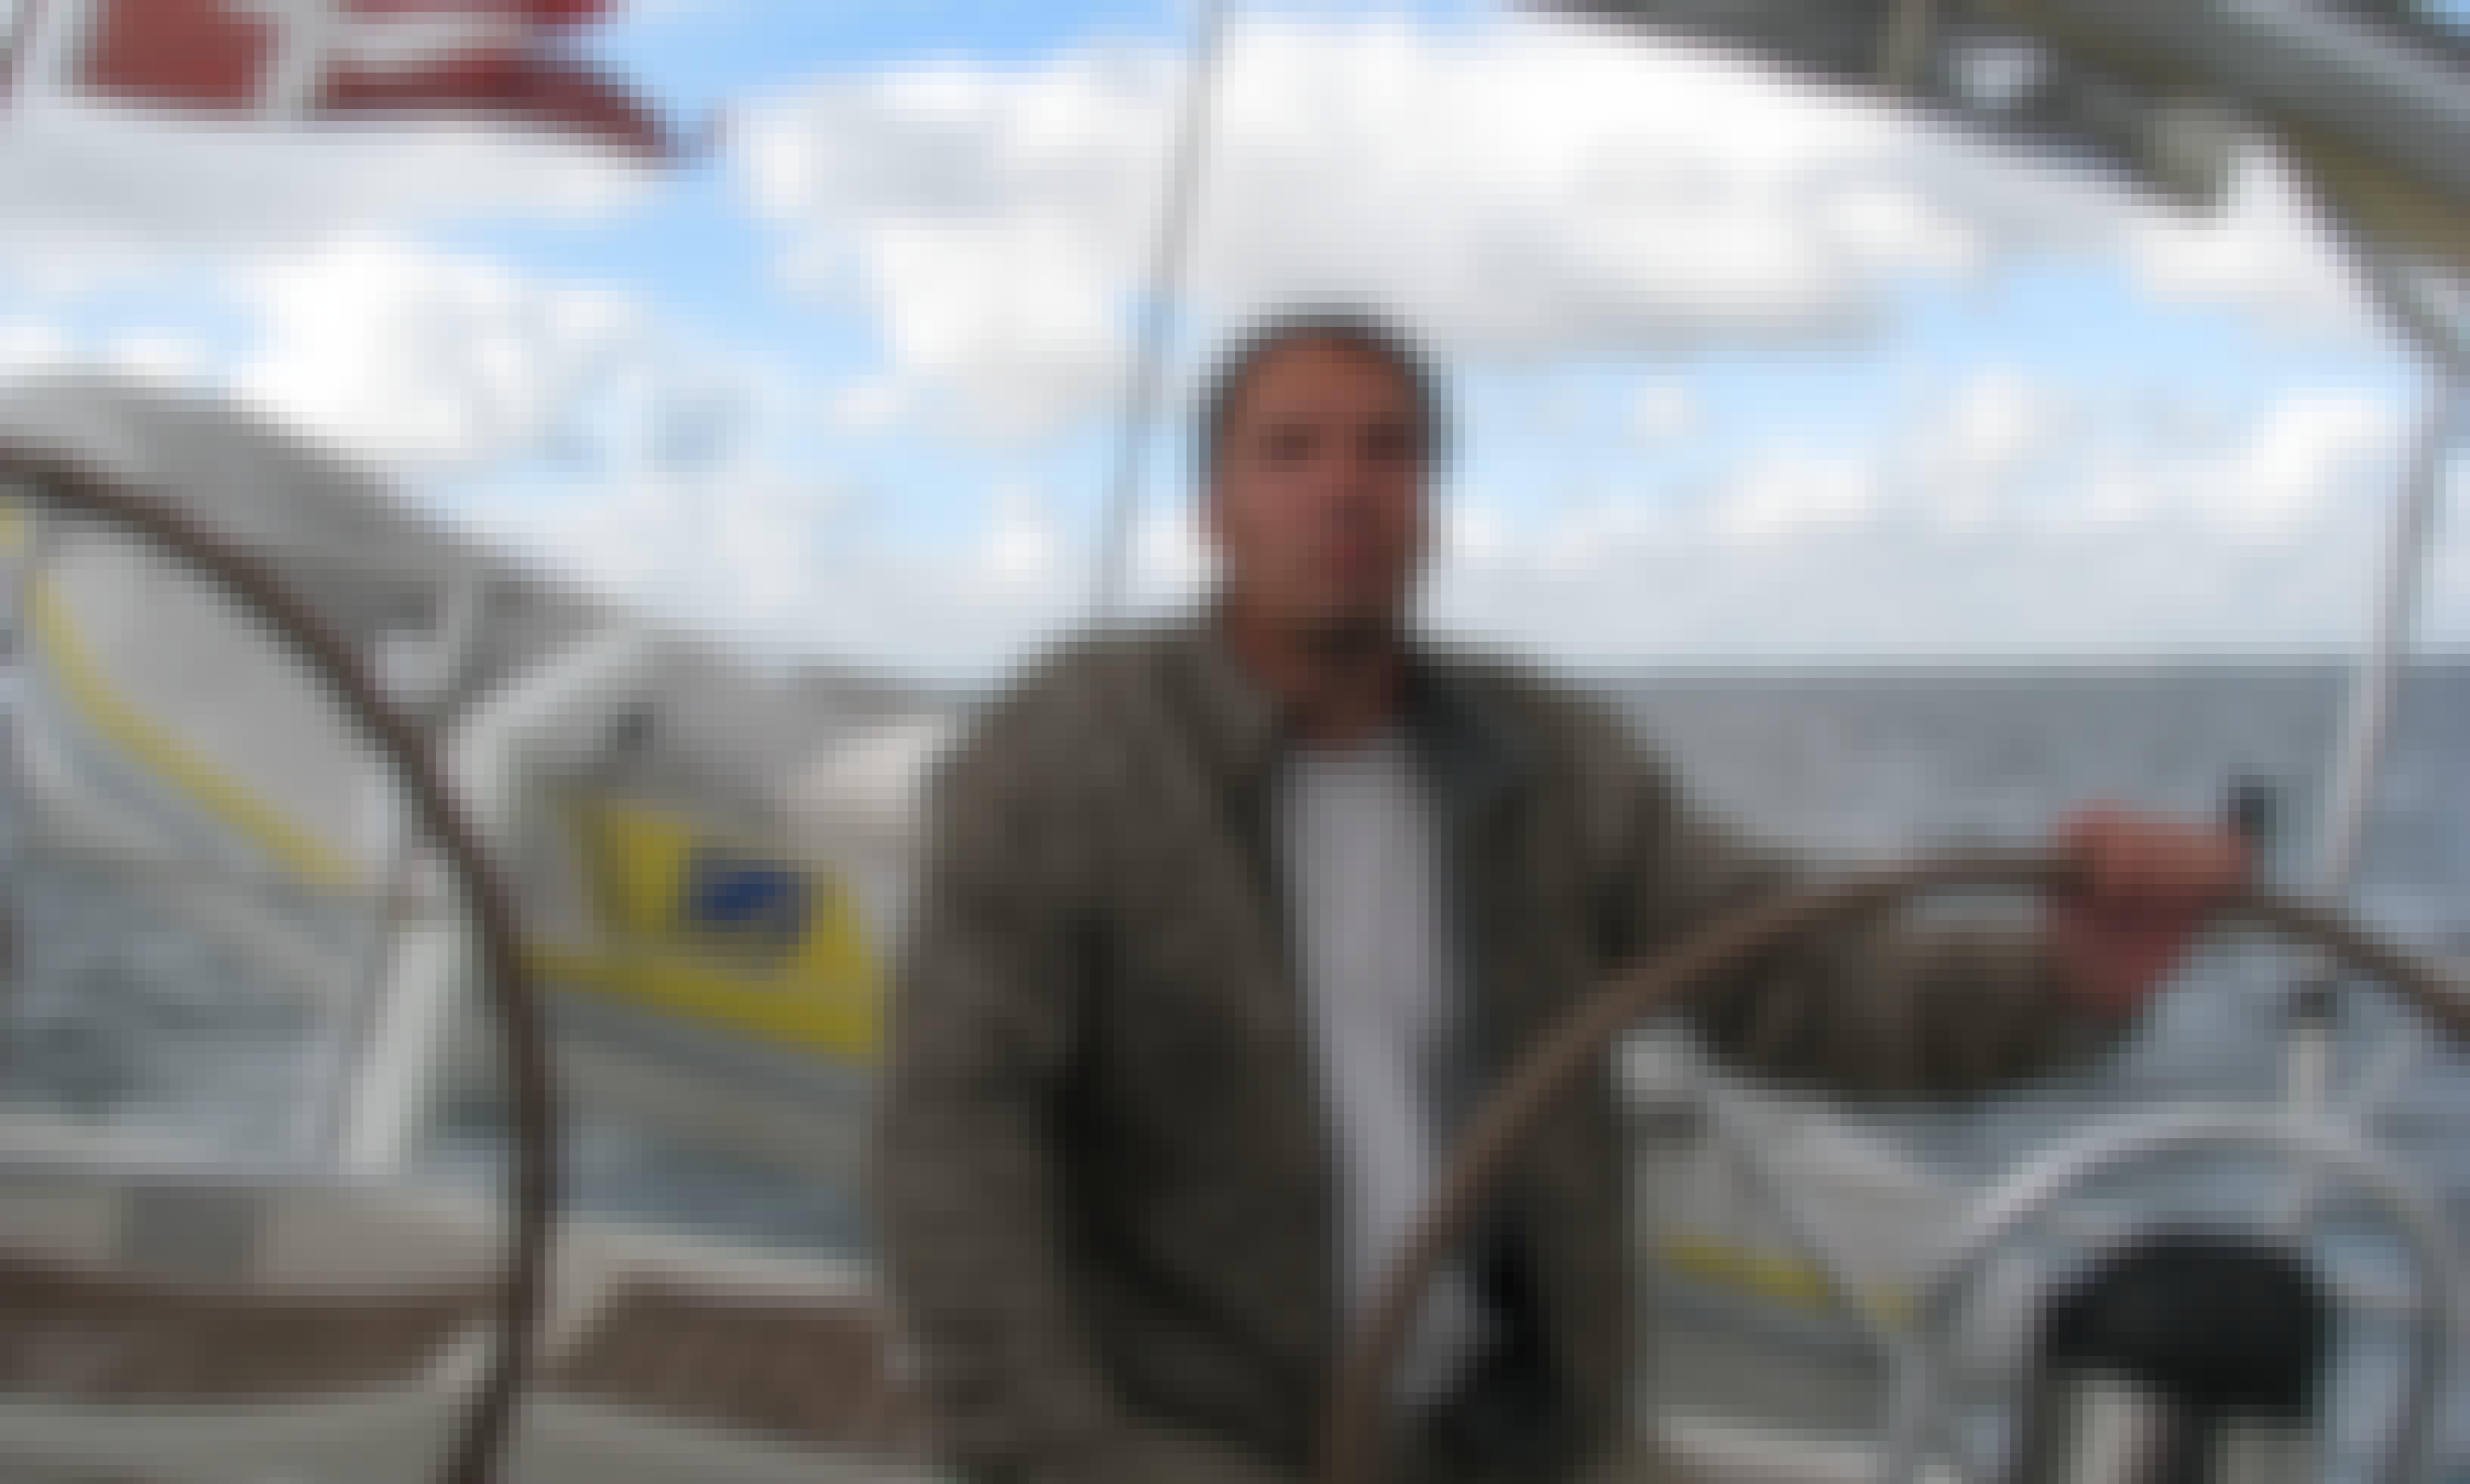 Beneteau Oceanis 500 Sailing Yacht Charter in Ishøj, Denmark